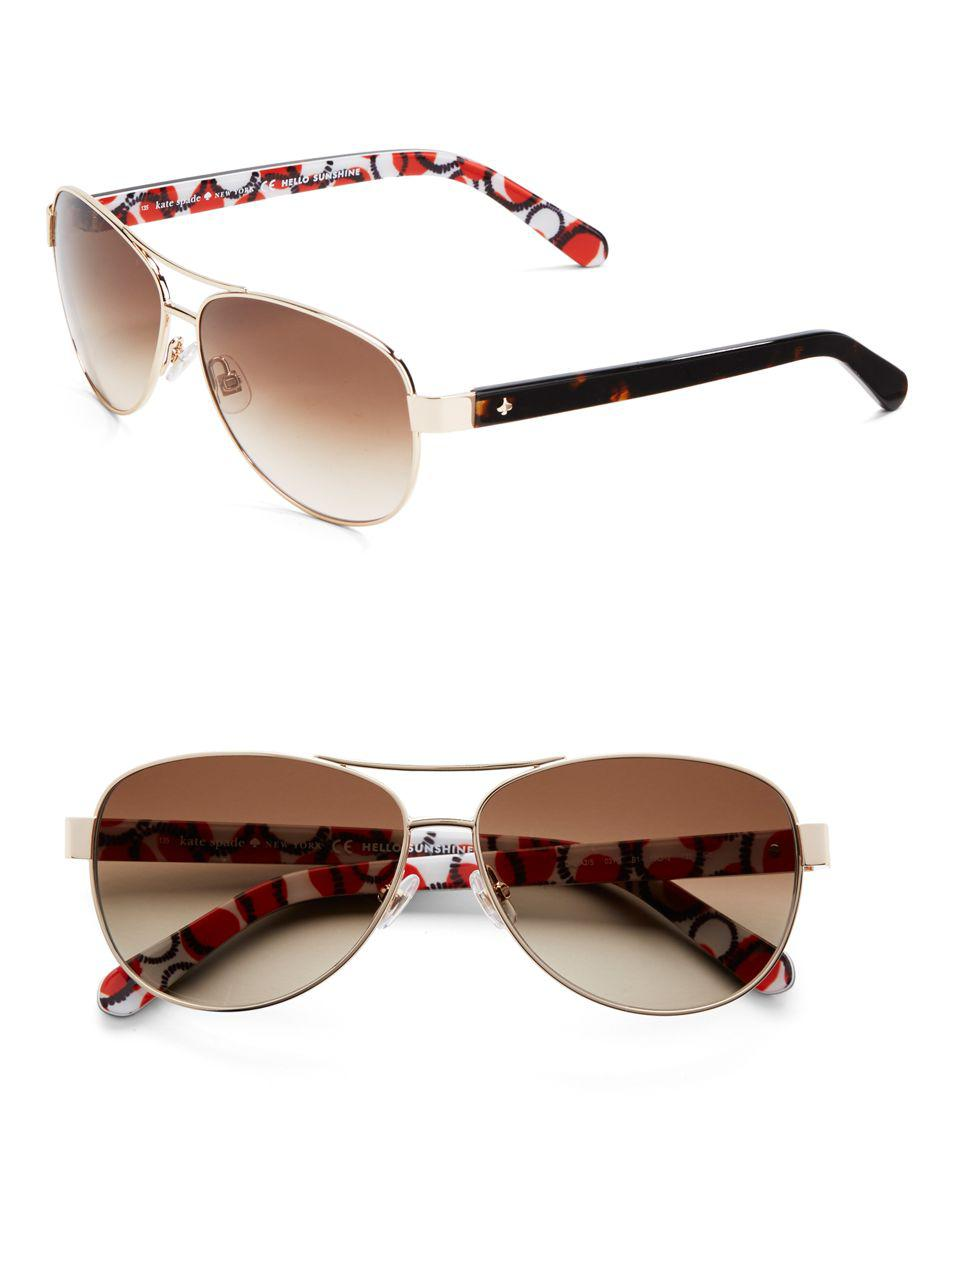 9c274edfef Lyst - Kate Spade 58mm Dalia Teardrop Aviator Sunglasses in Metallic